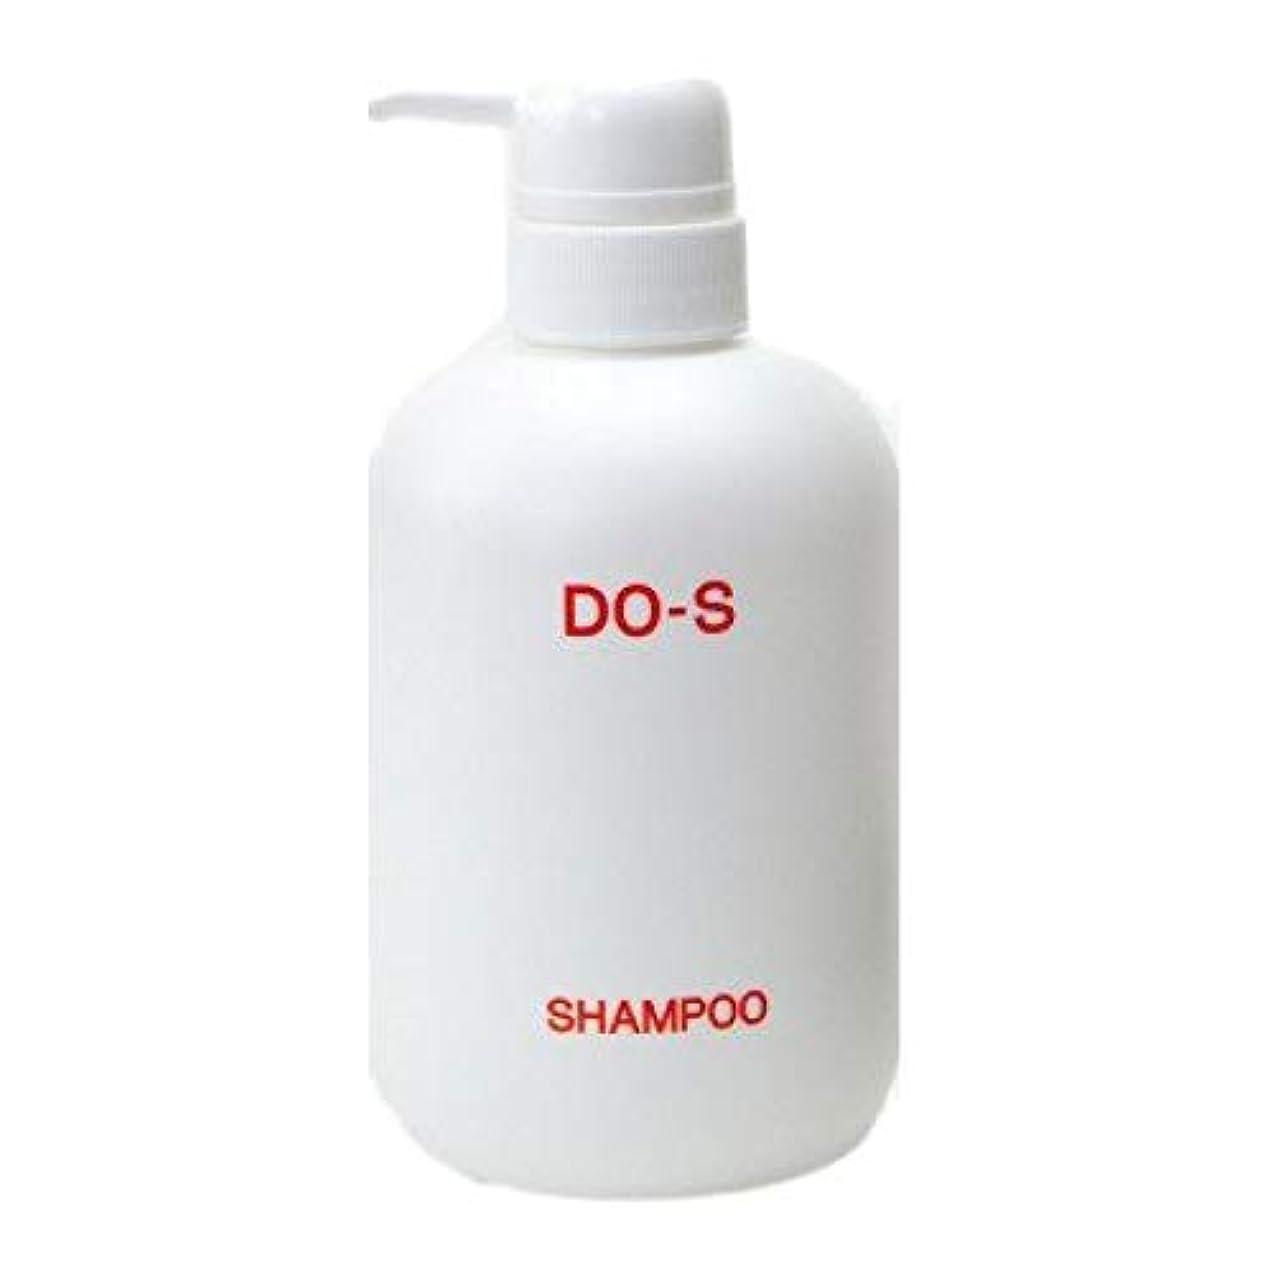 DO-S シャンプー 500ml ネット用